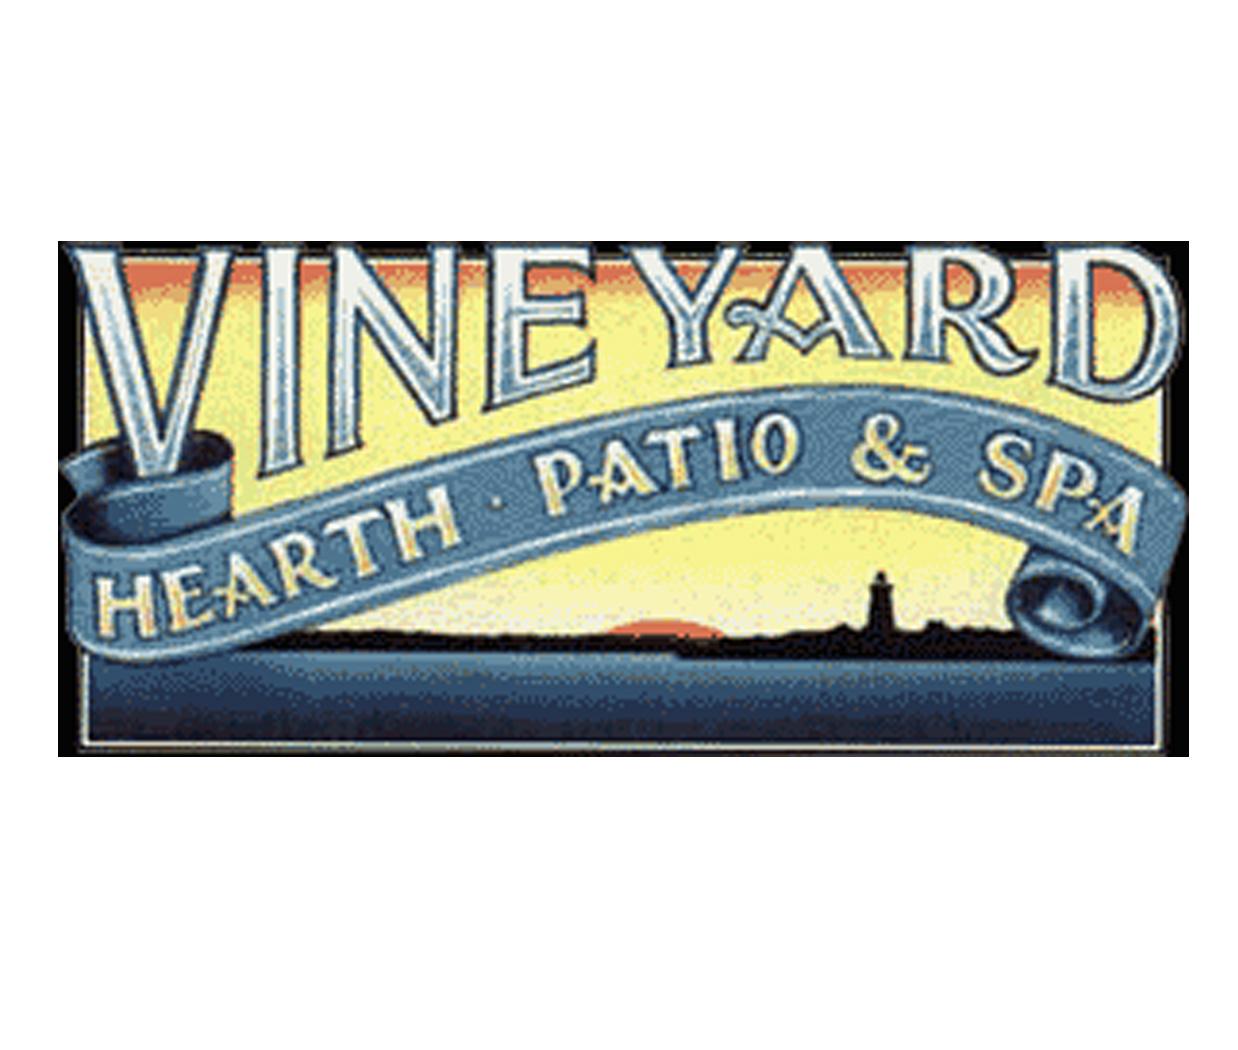 Vineyard Hearth Patio and Spa